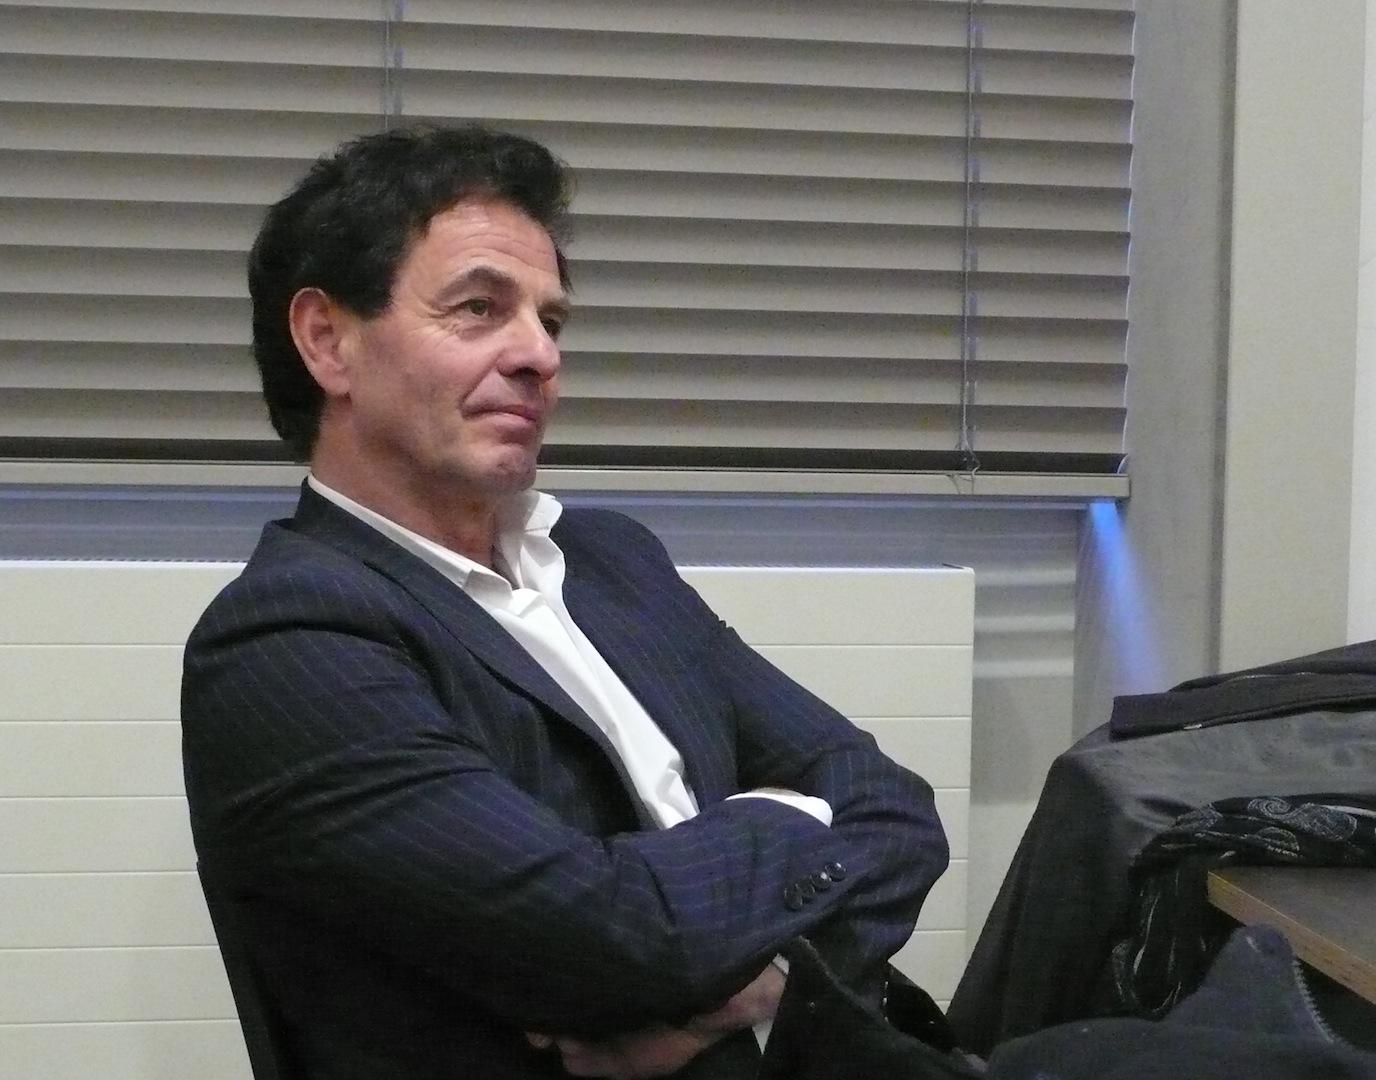 Jacques Grosperrin